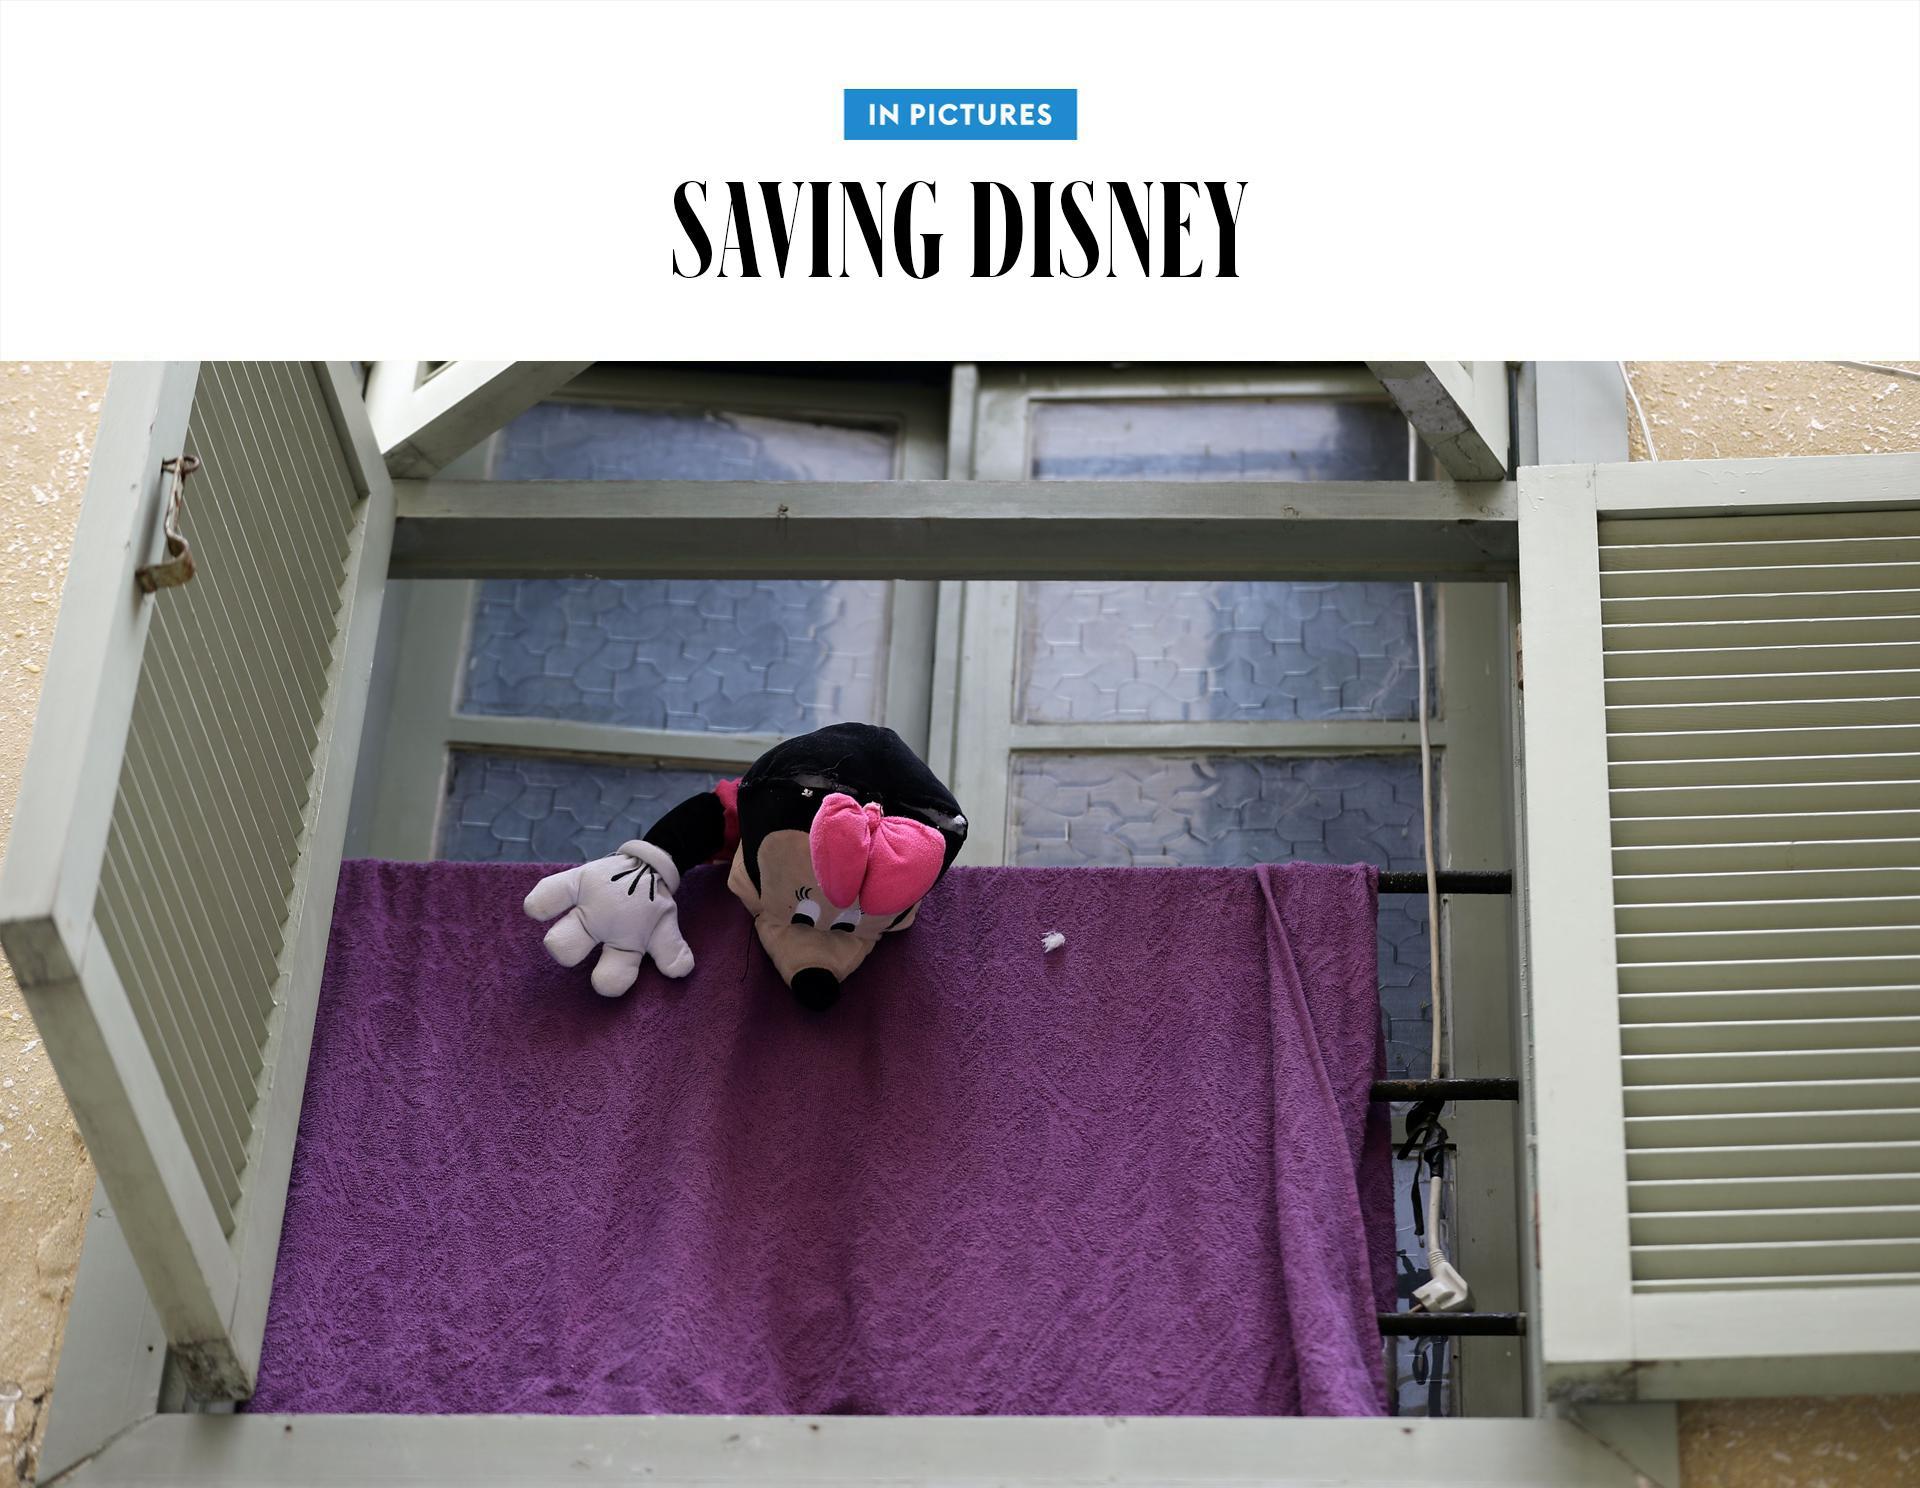 Saving Disney: Iger Returns As Coronavirus Batters The Company On All Sides